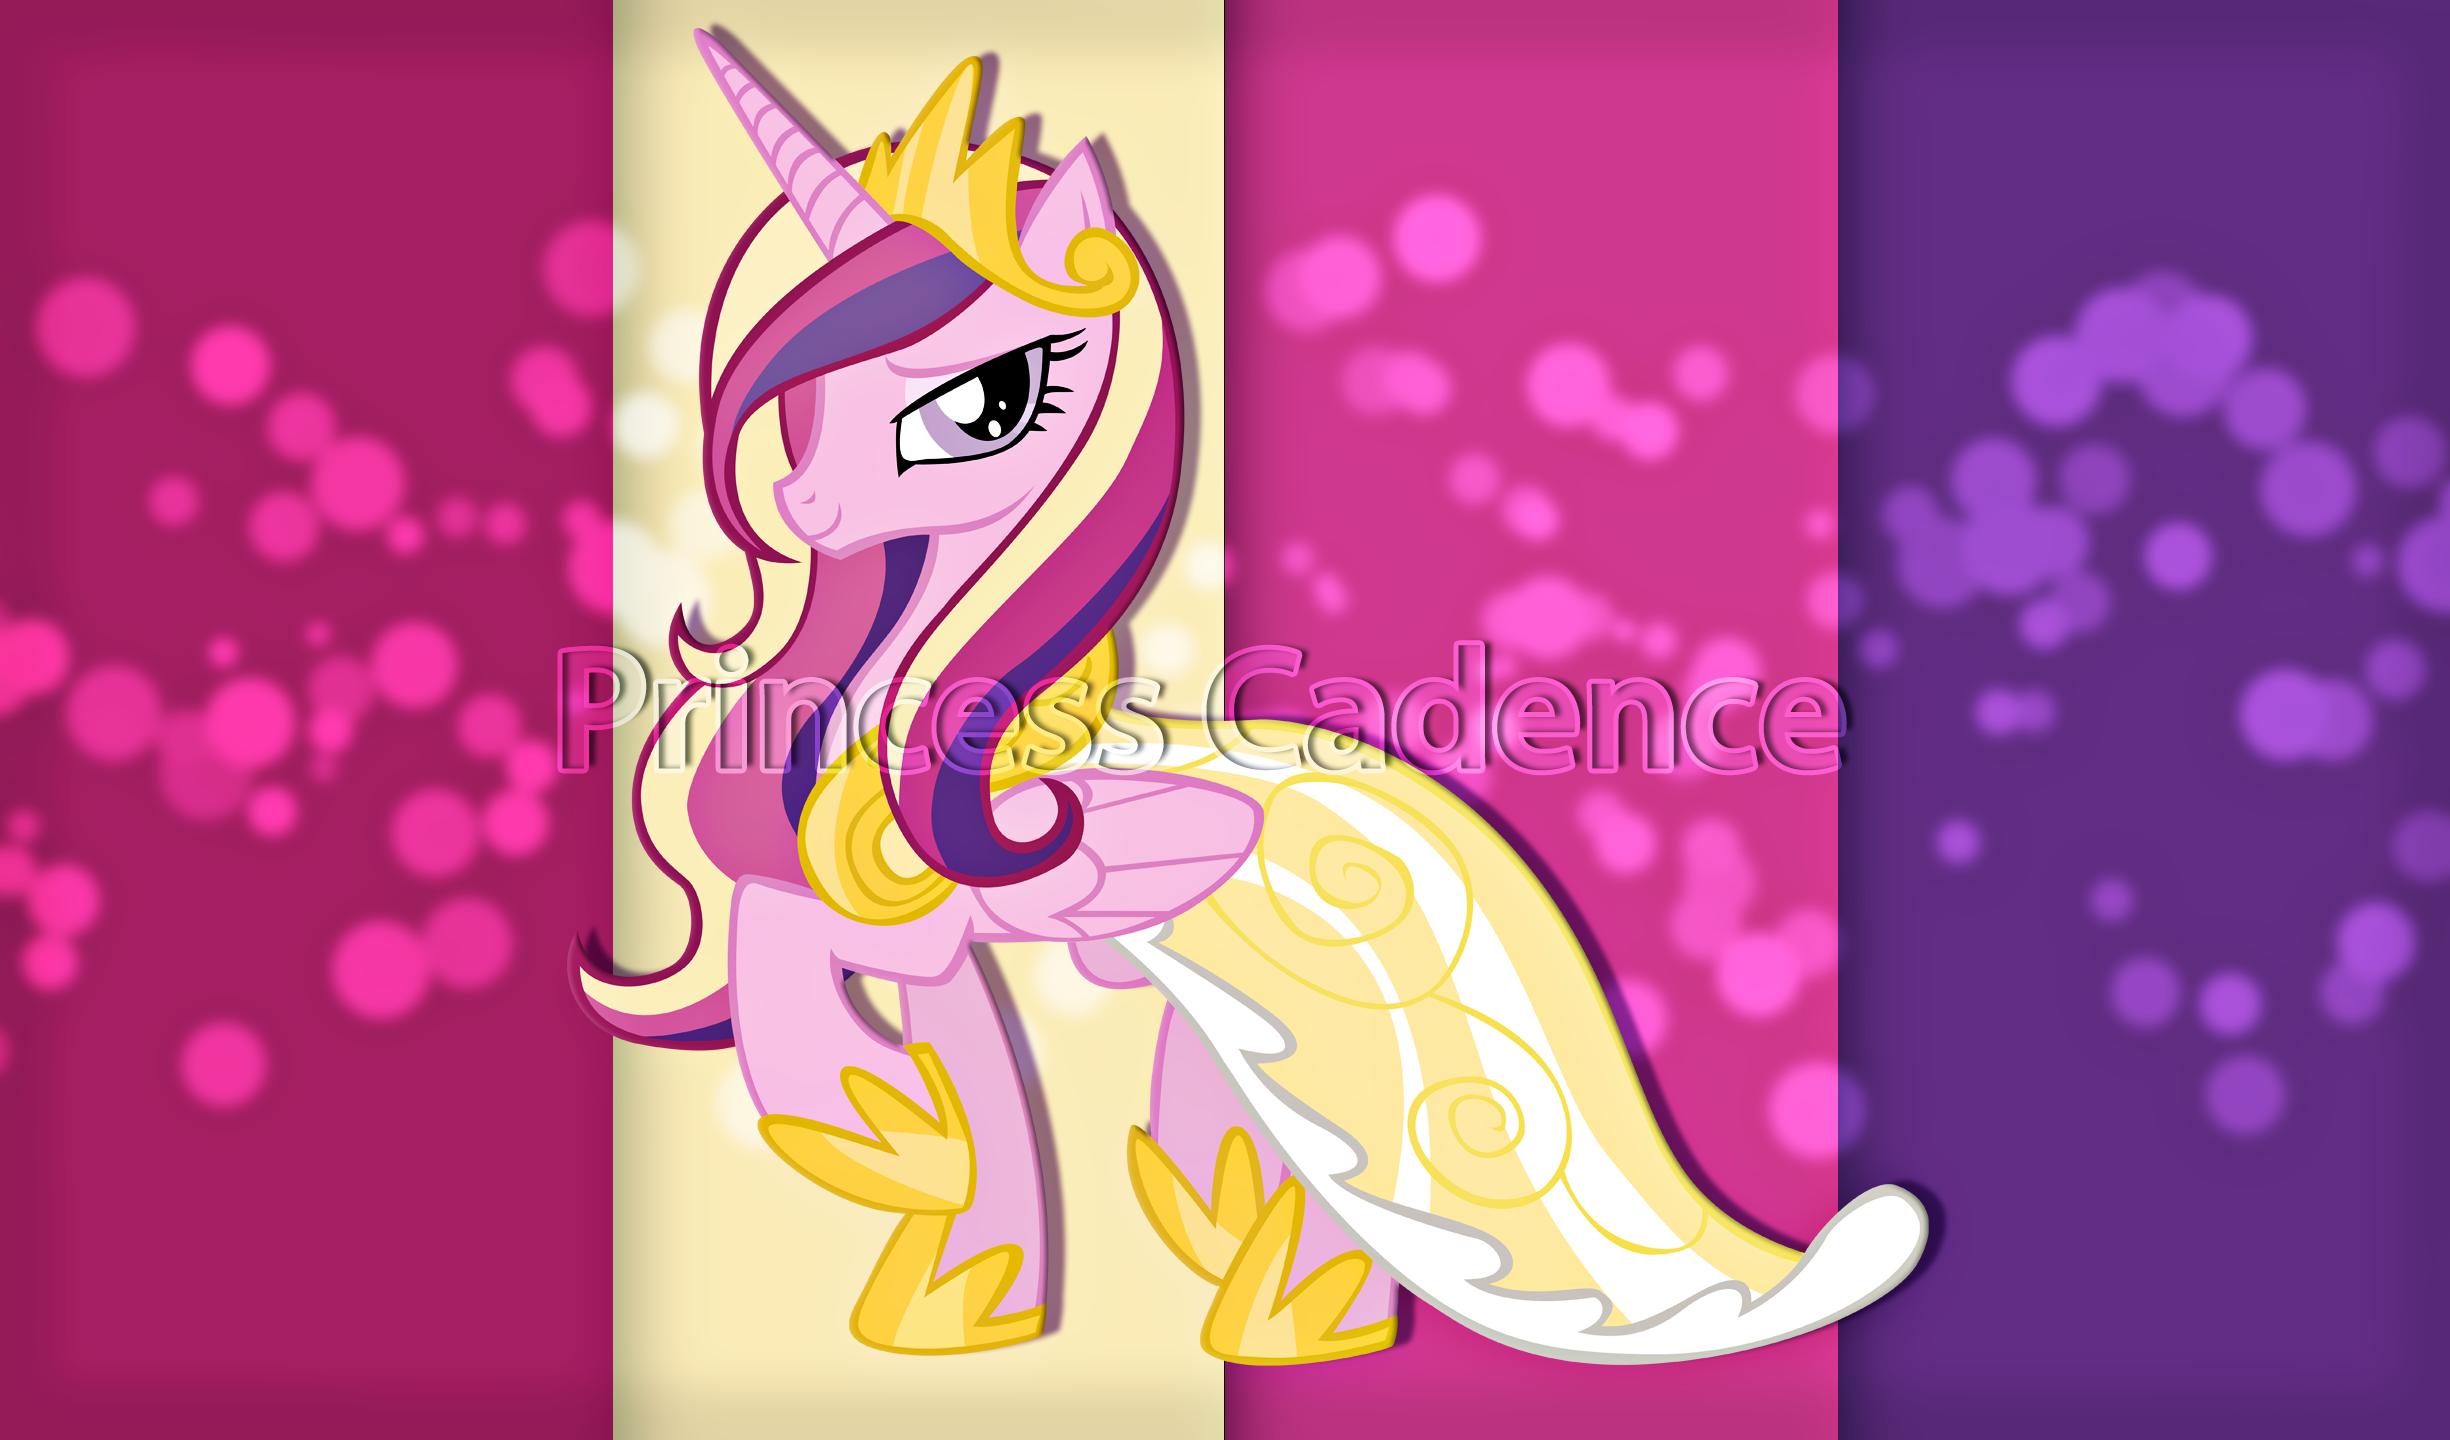 Princess Cadence Wallpaper by alanfernandoflores01